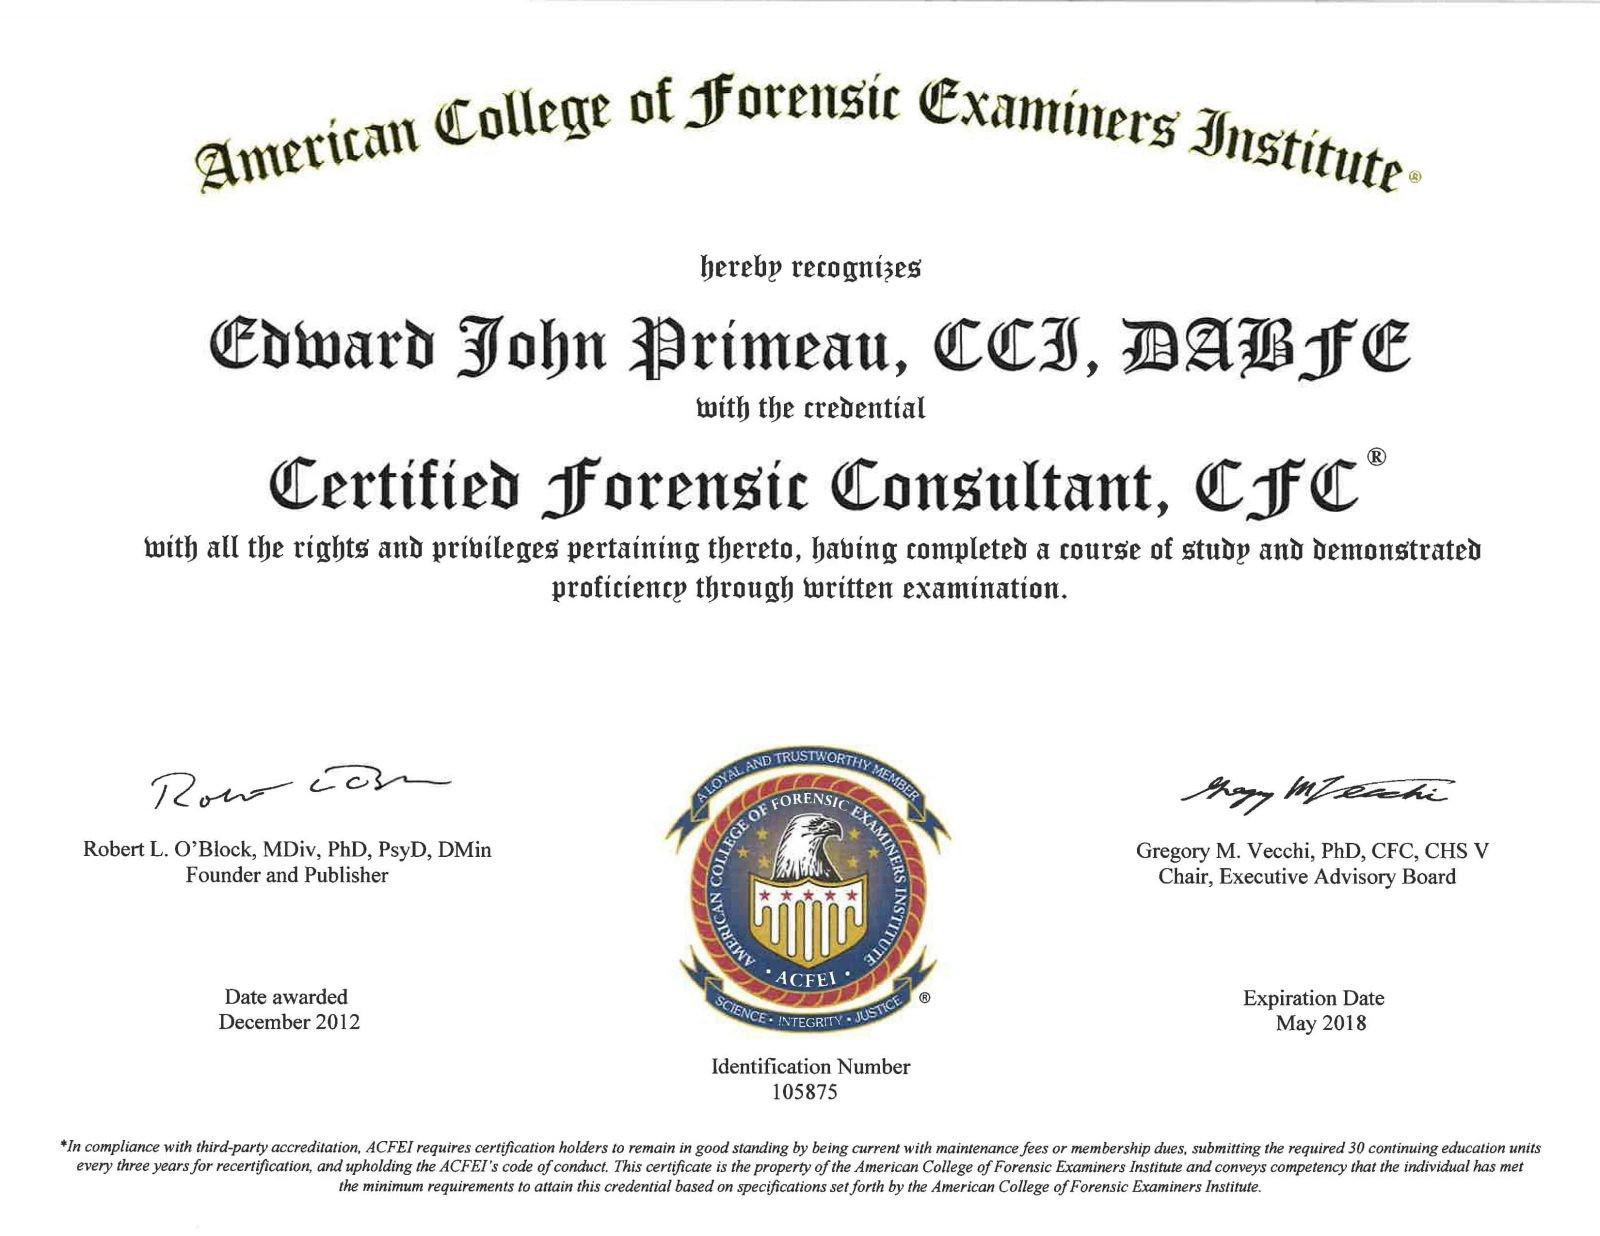 CFC ACFEI - Meet Edward Primeau, CCI, CFC